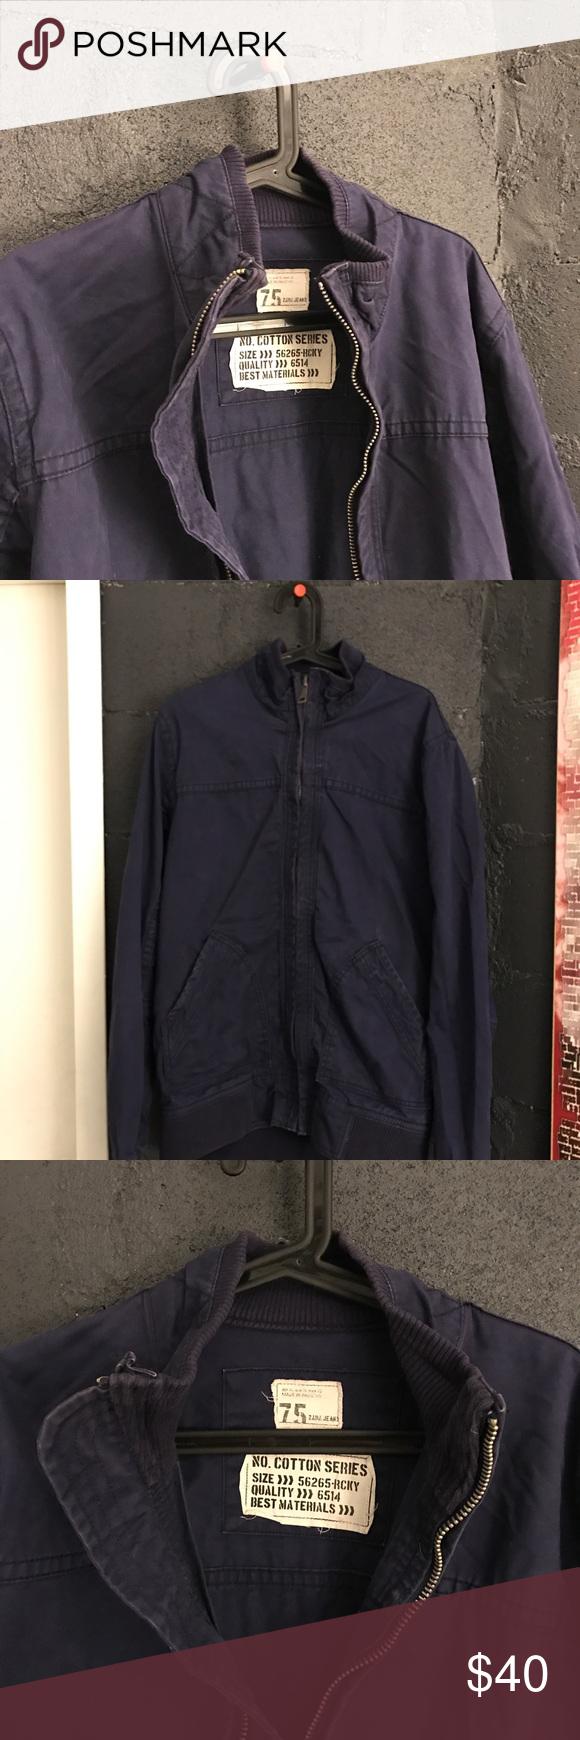 Zara flannel shirt mens  ZARA Menus Jacket  Coats Jackets and Shirts